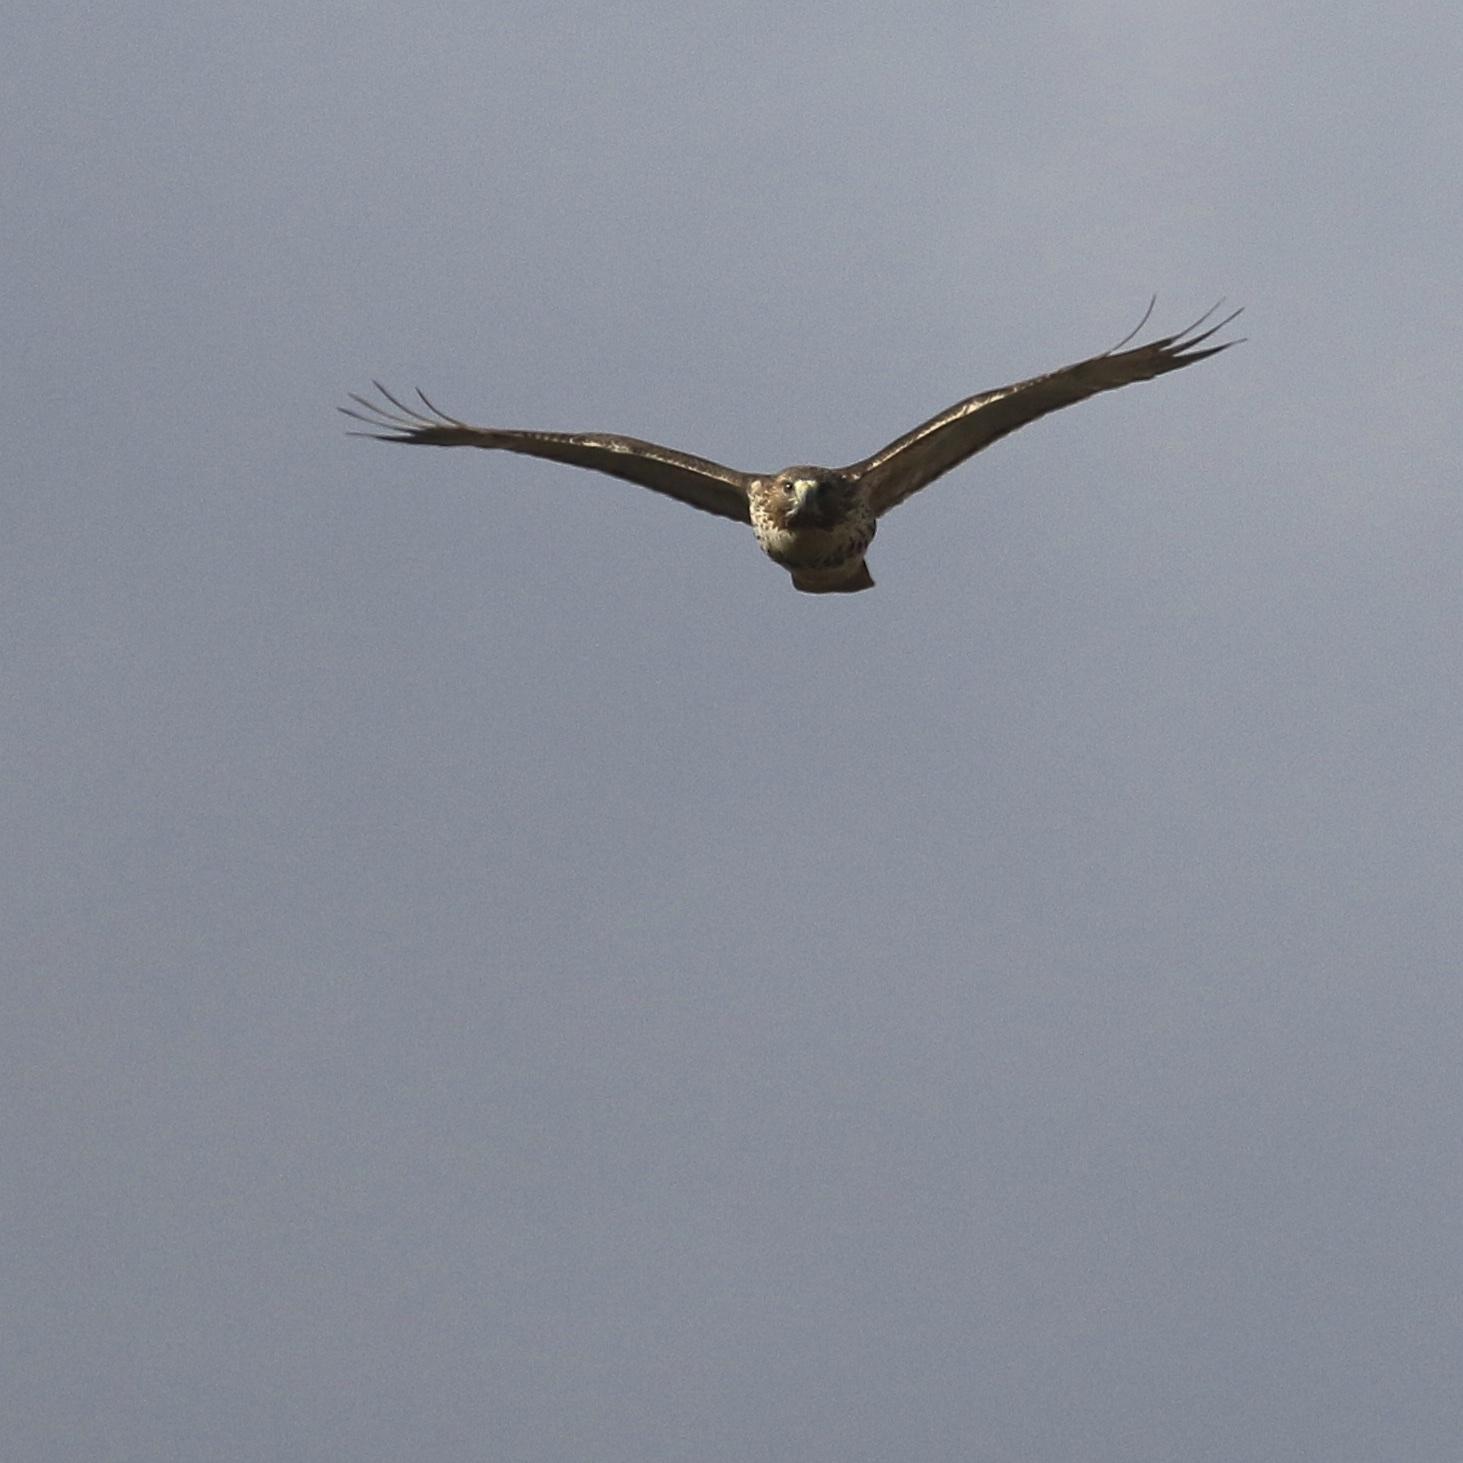 ~Red-tailed Hawk at Wallkill River NWR, 12/28/15.~